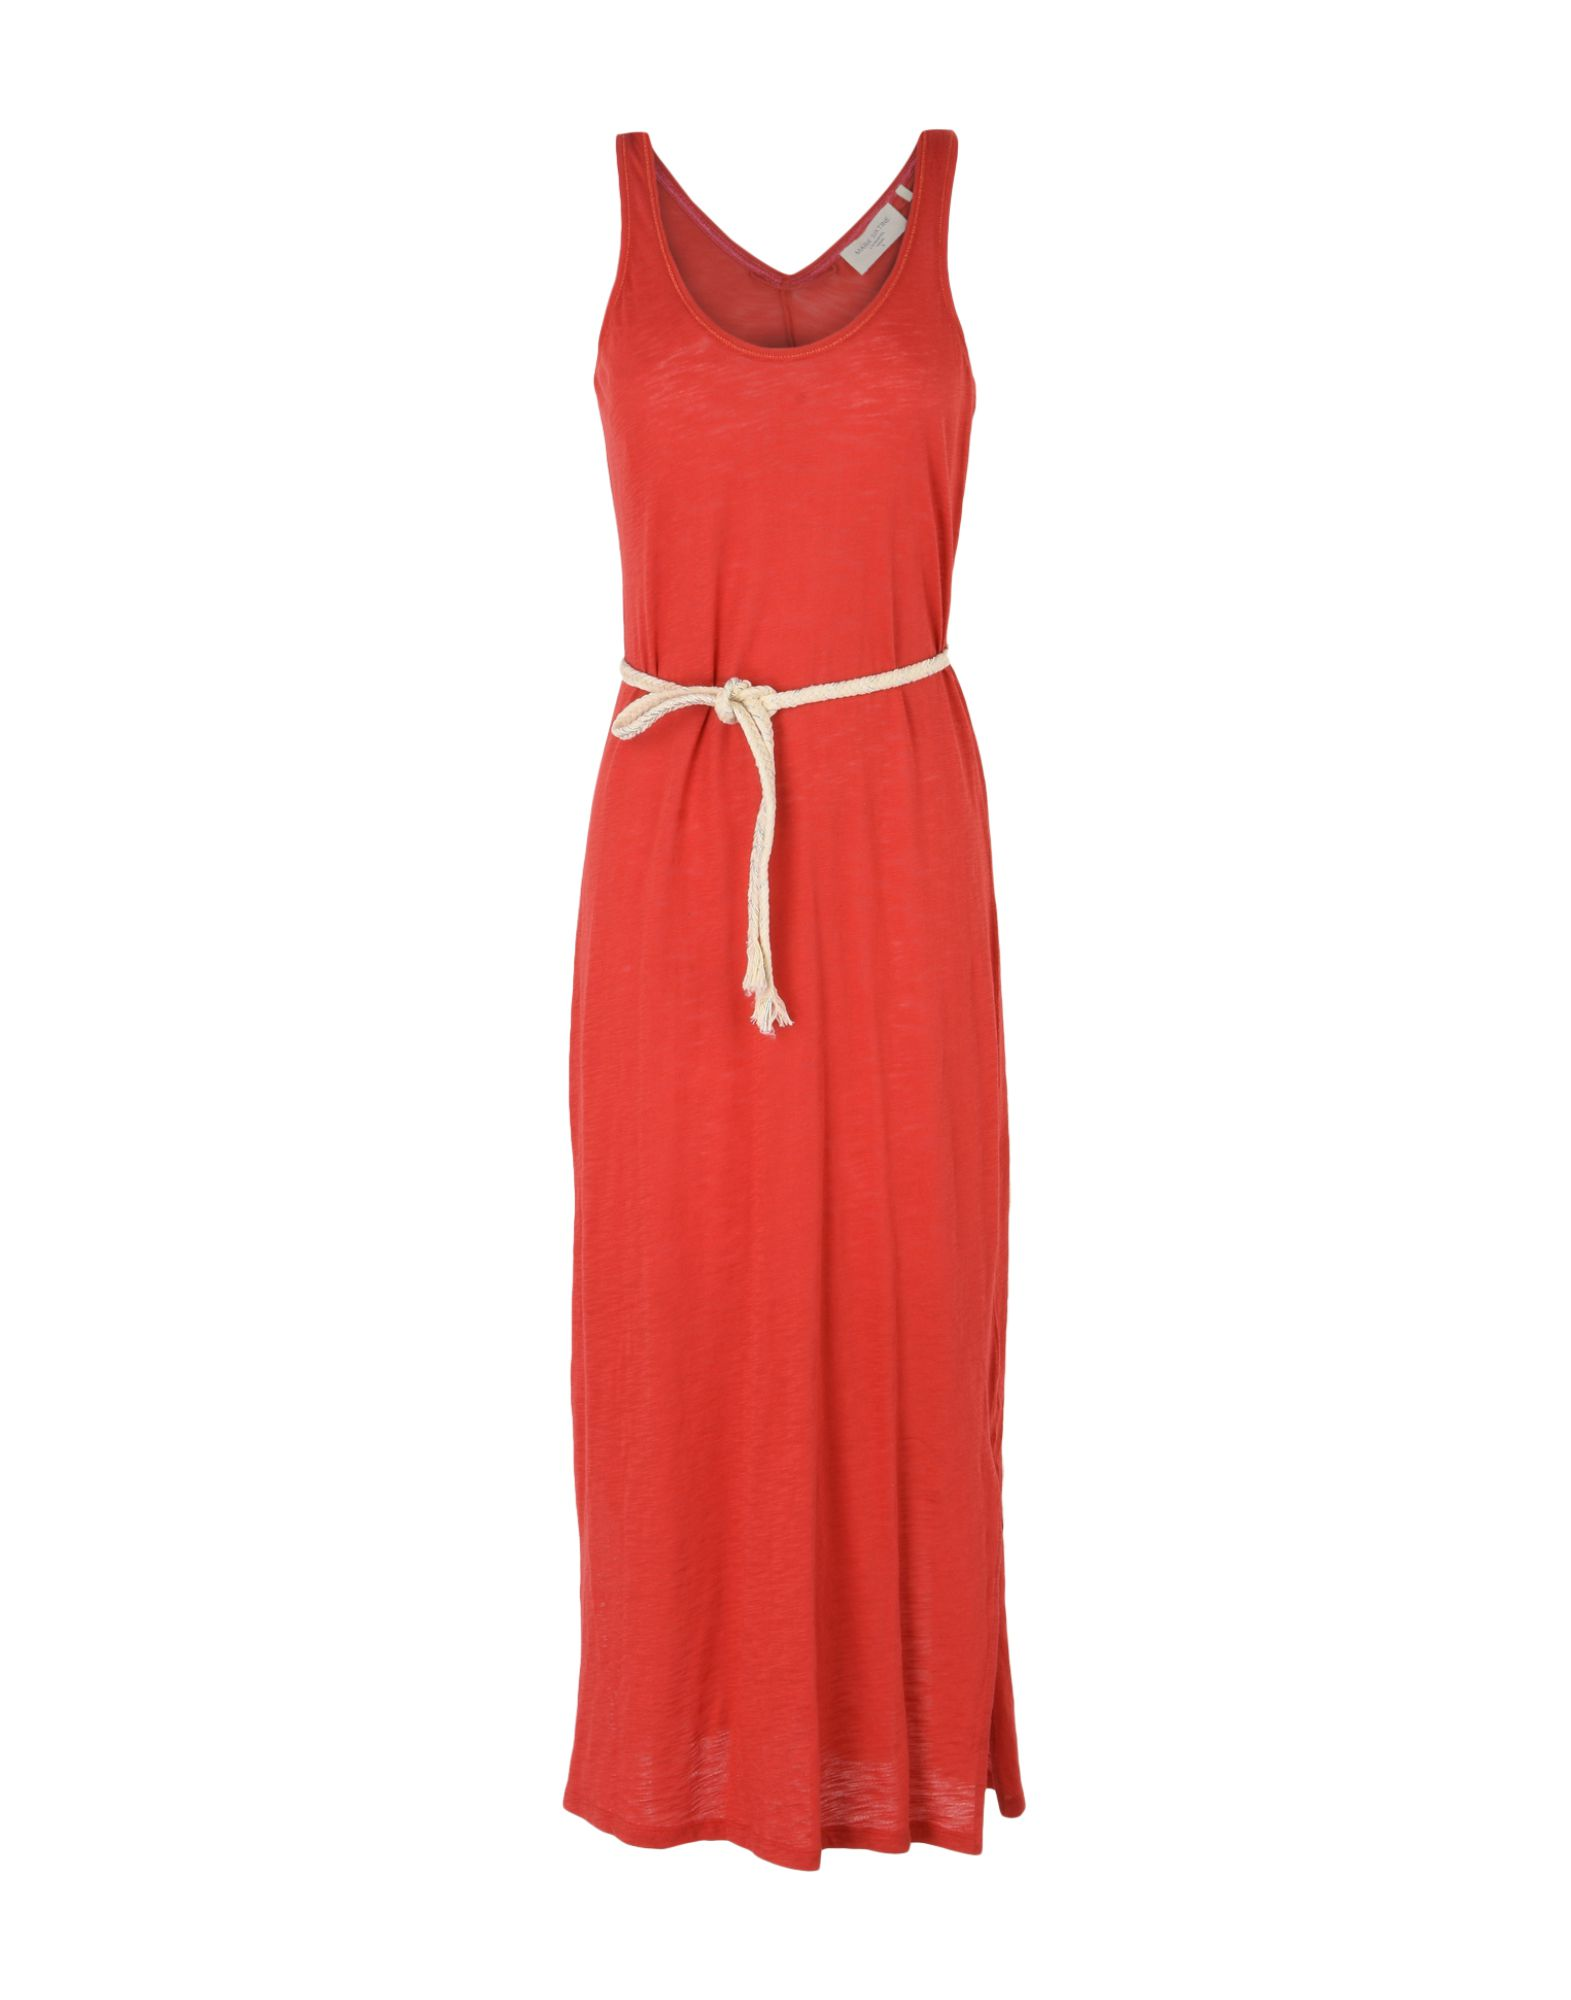 MARIE SIXTINE Платье длиной 3/4 lisa corti платье длиной 3 4